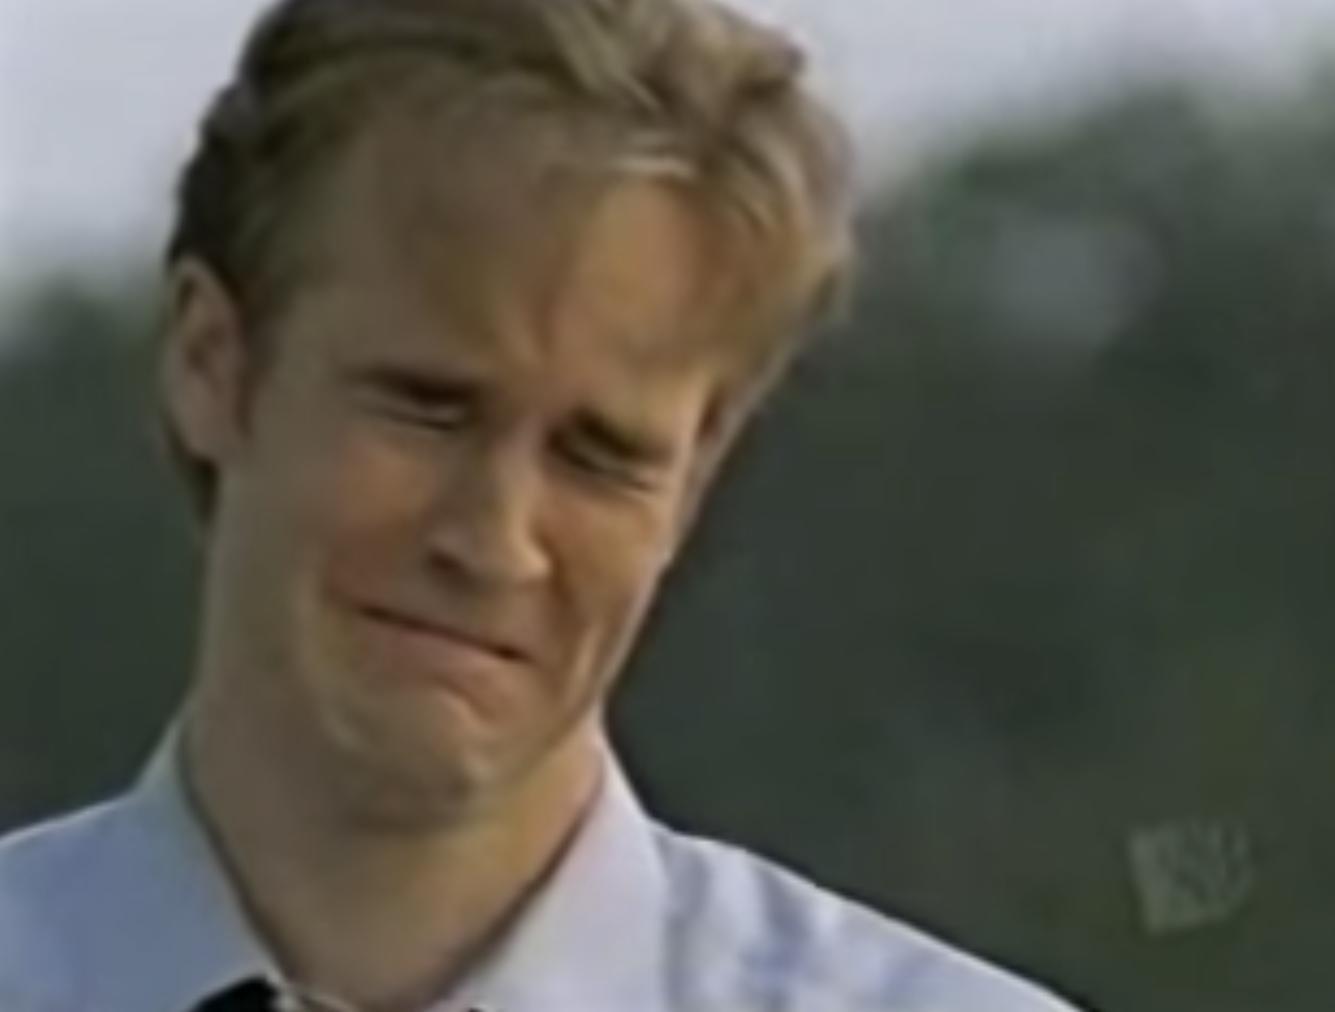 Dawson crying because Joey left him.